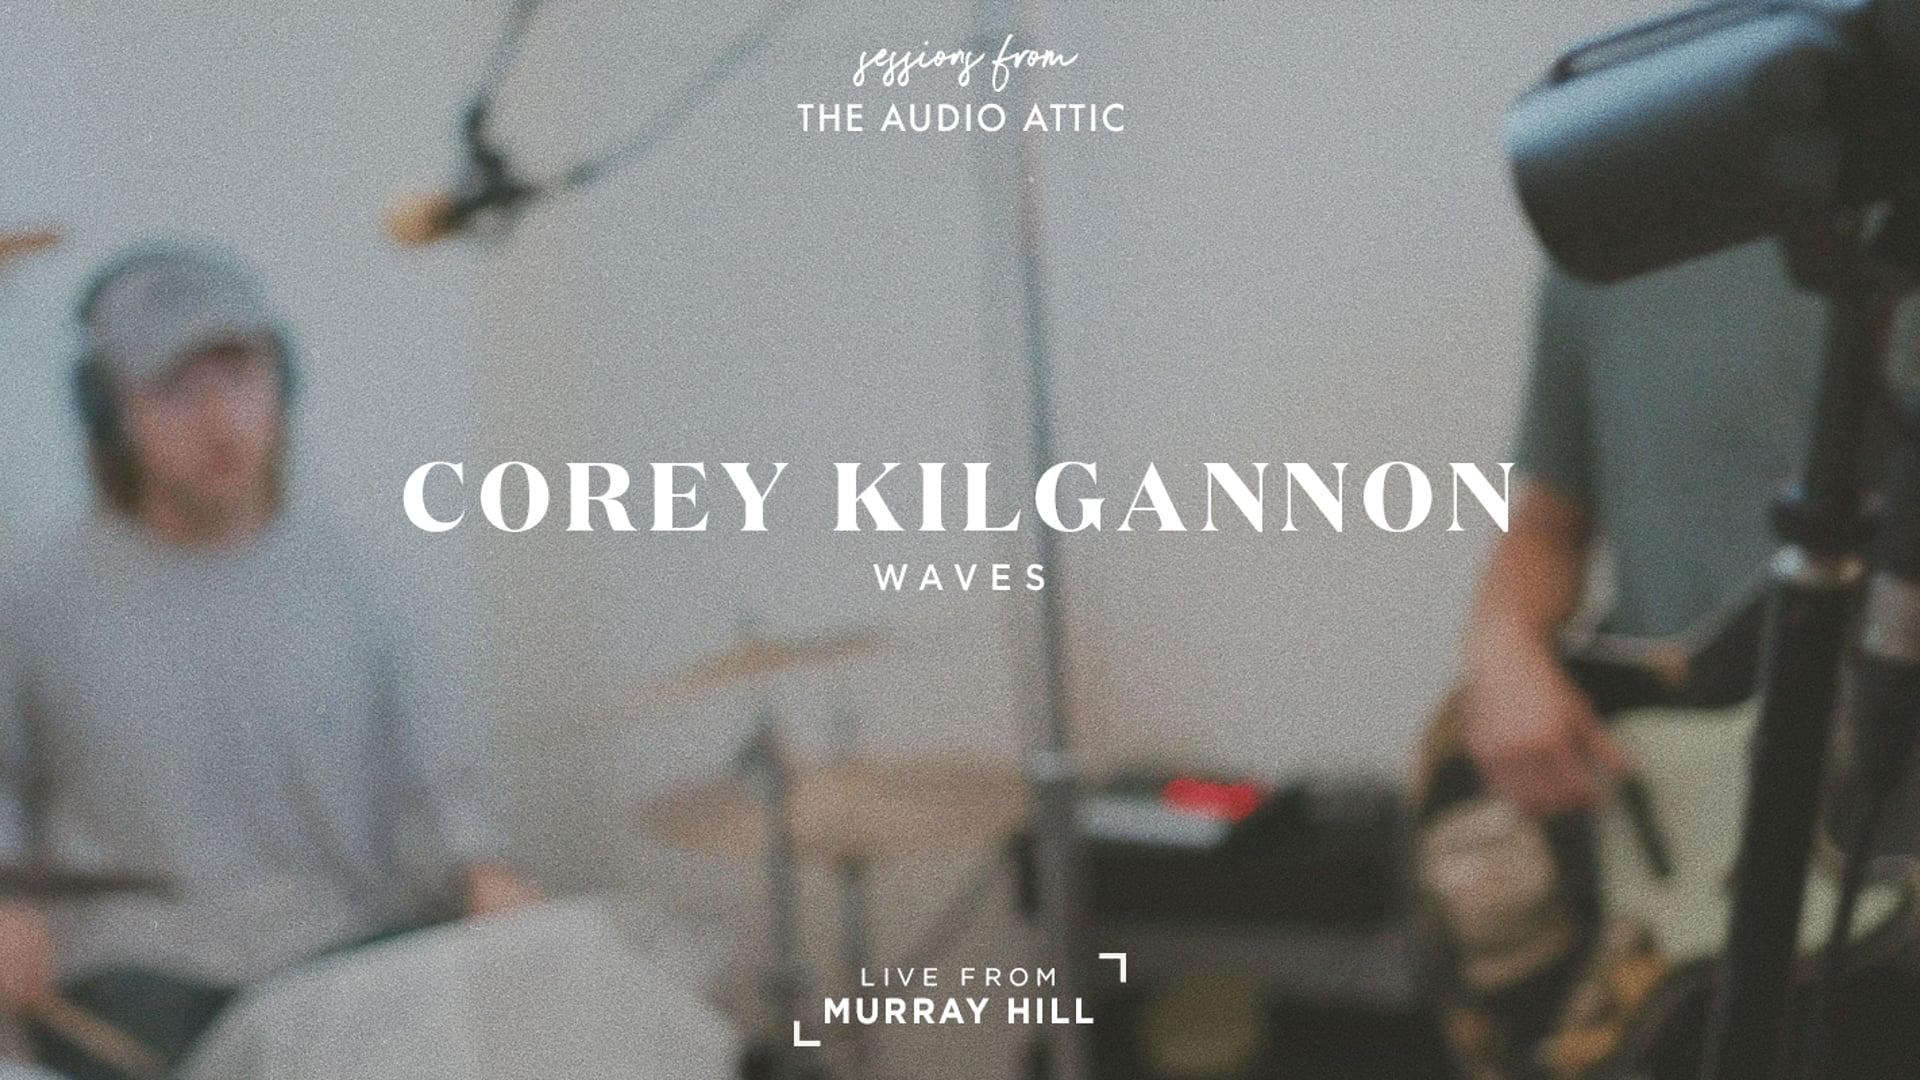 The Audio Attic Sessions - Corey Kilgannon - Waves